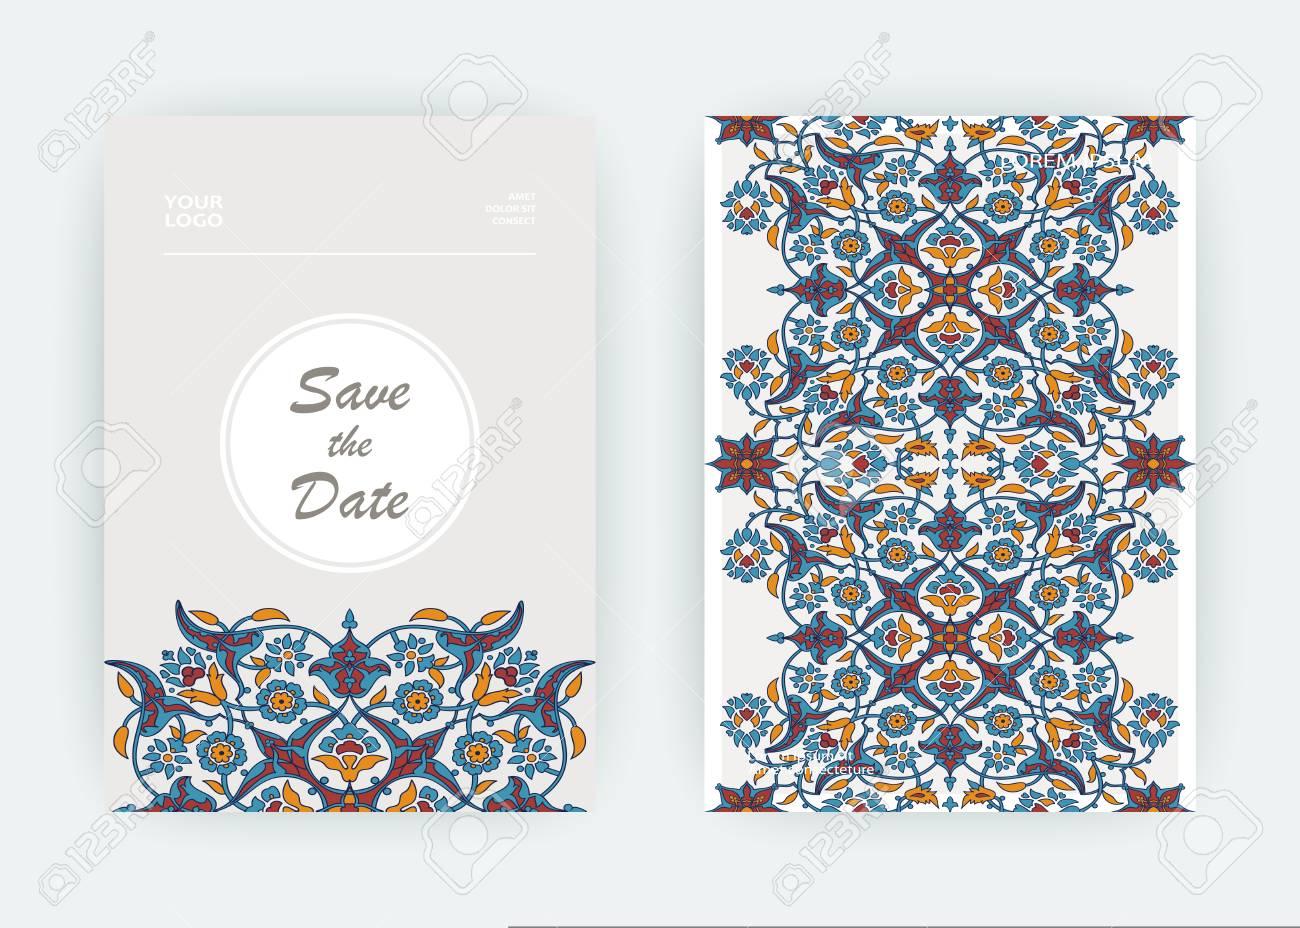 Arabesque Floral Decoration Print Border Design Template Vector